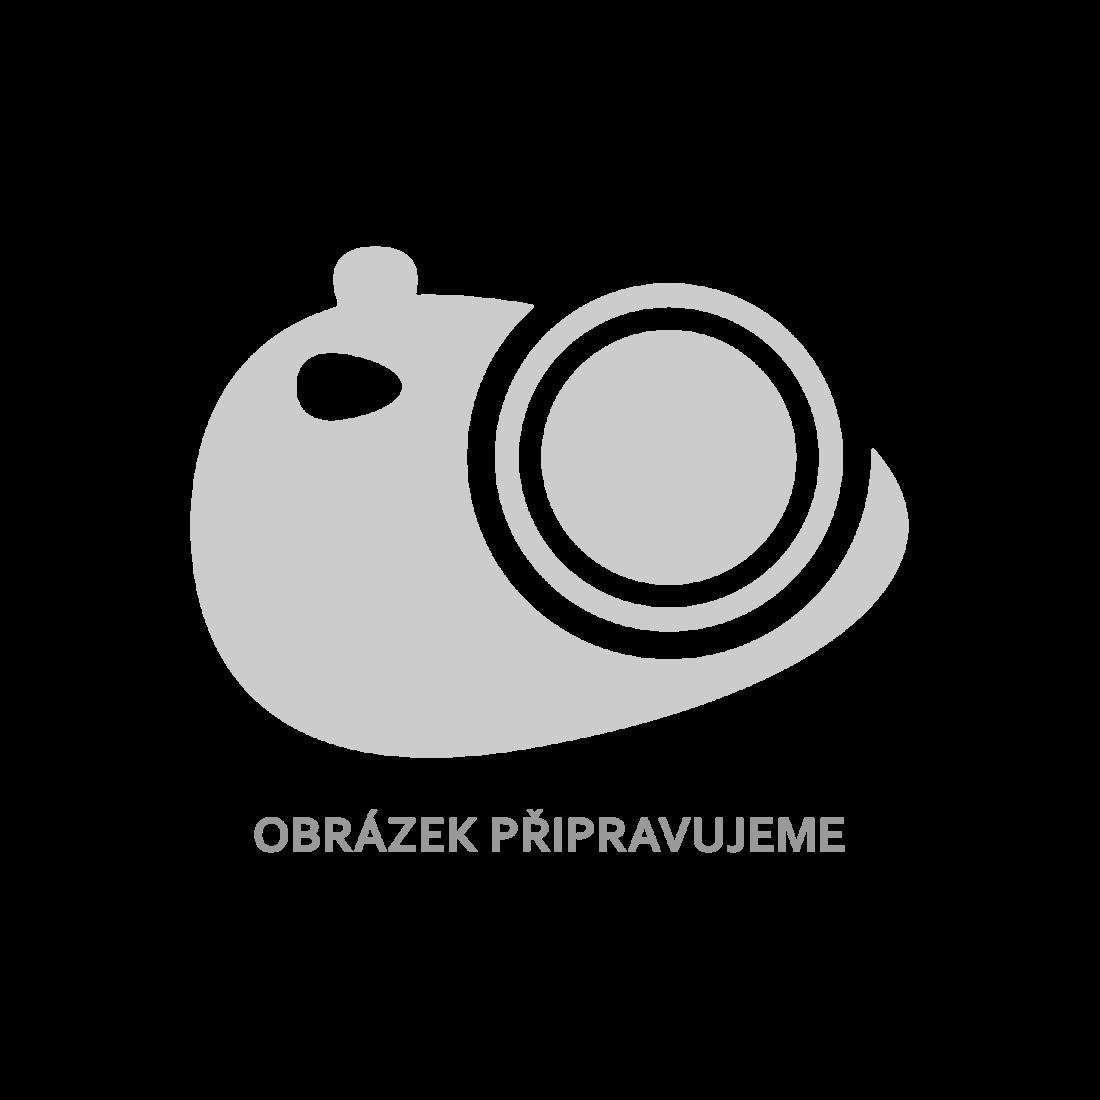 vidaXL Úložný box bílý 110 x 40 x 45 cm masivní akáciové dřevo [247670]